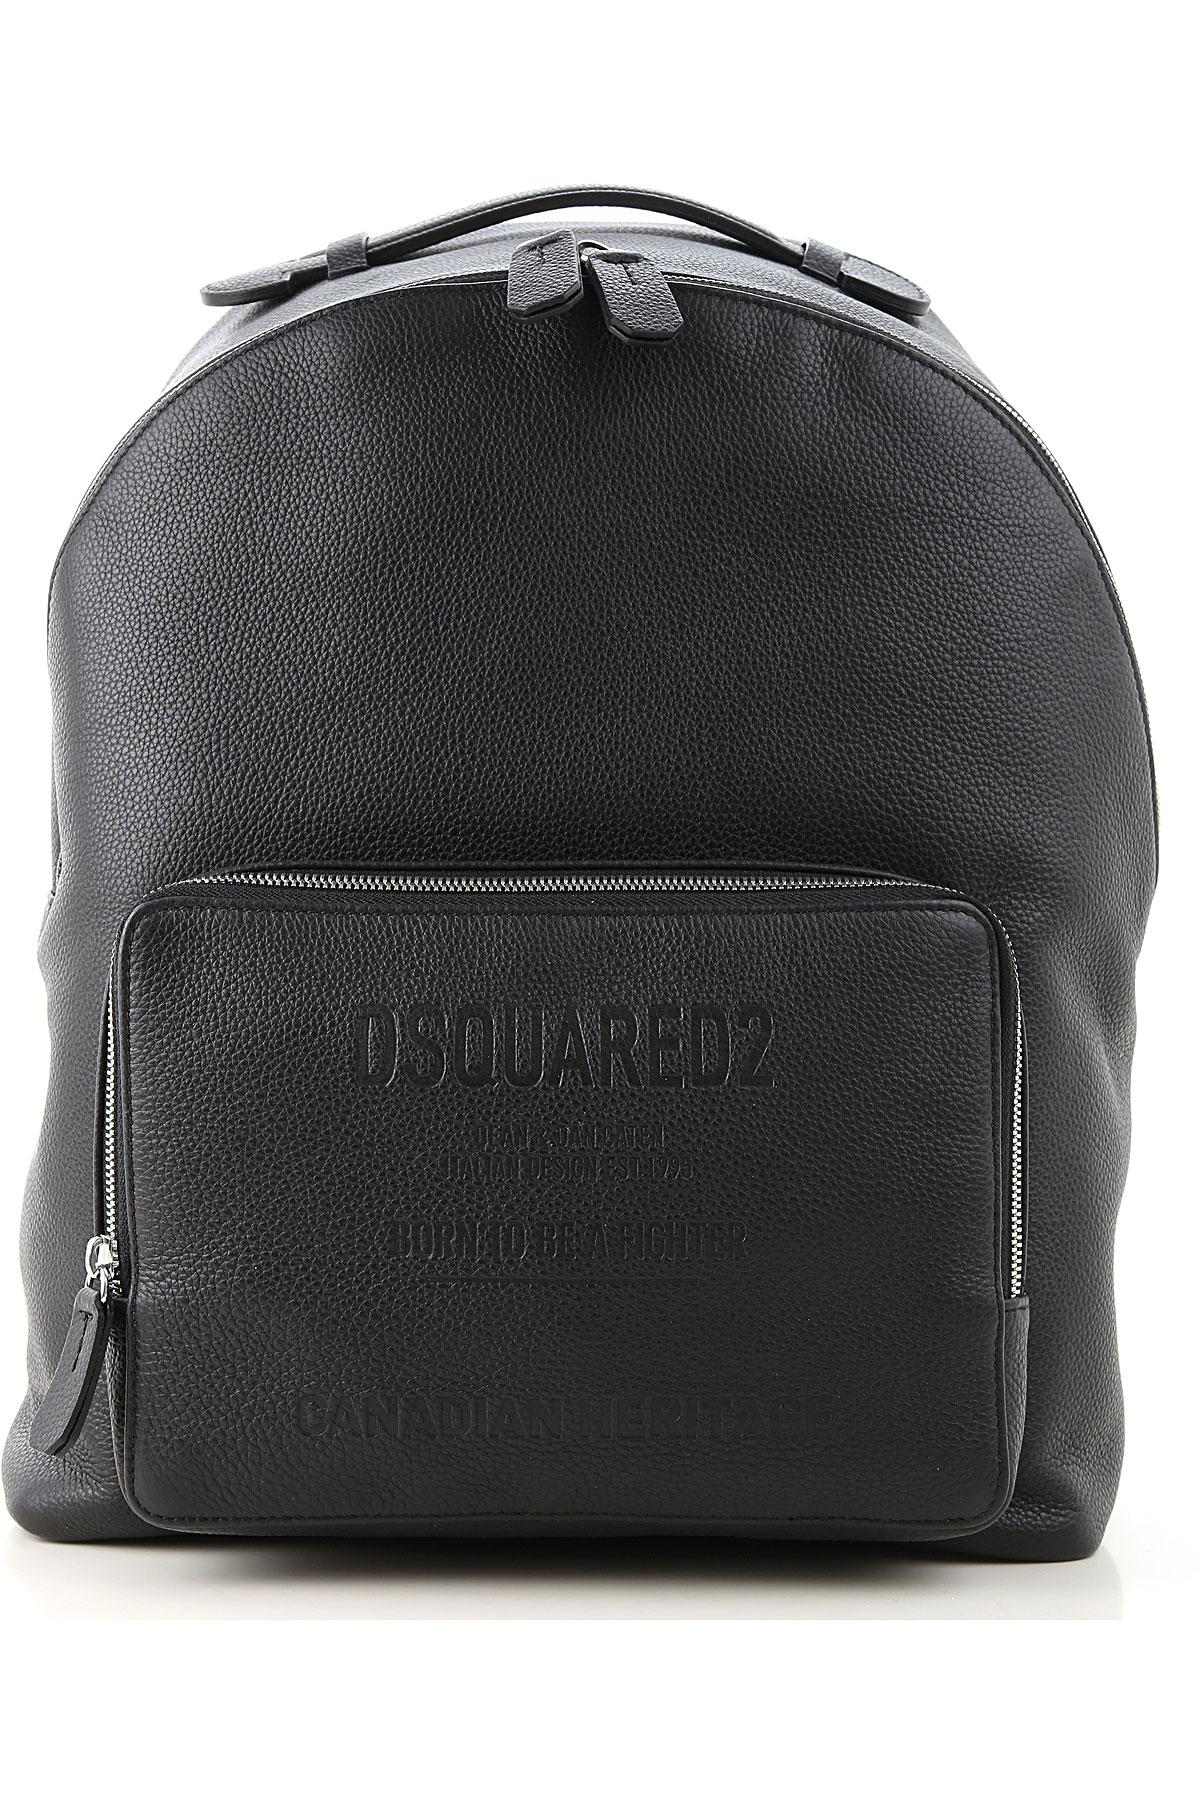 Dsquared2 Backpack for Men On Sale, Black, Leather, 2019